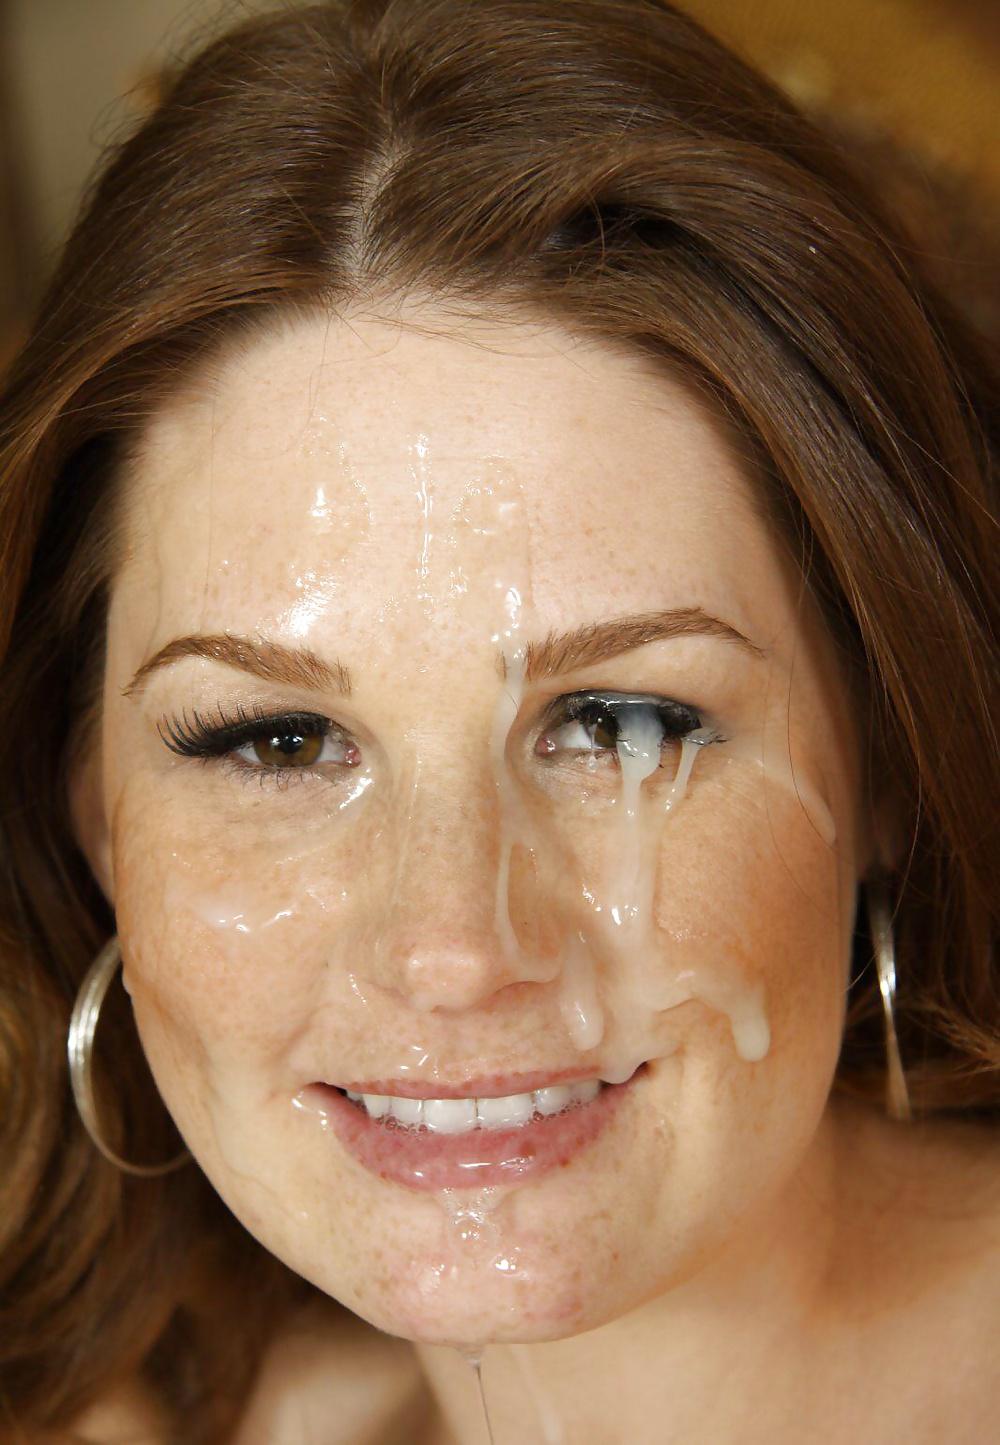 Tiffany Mynx Milf Facial Overload